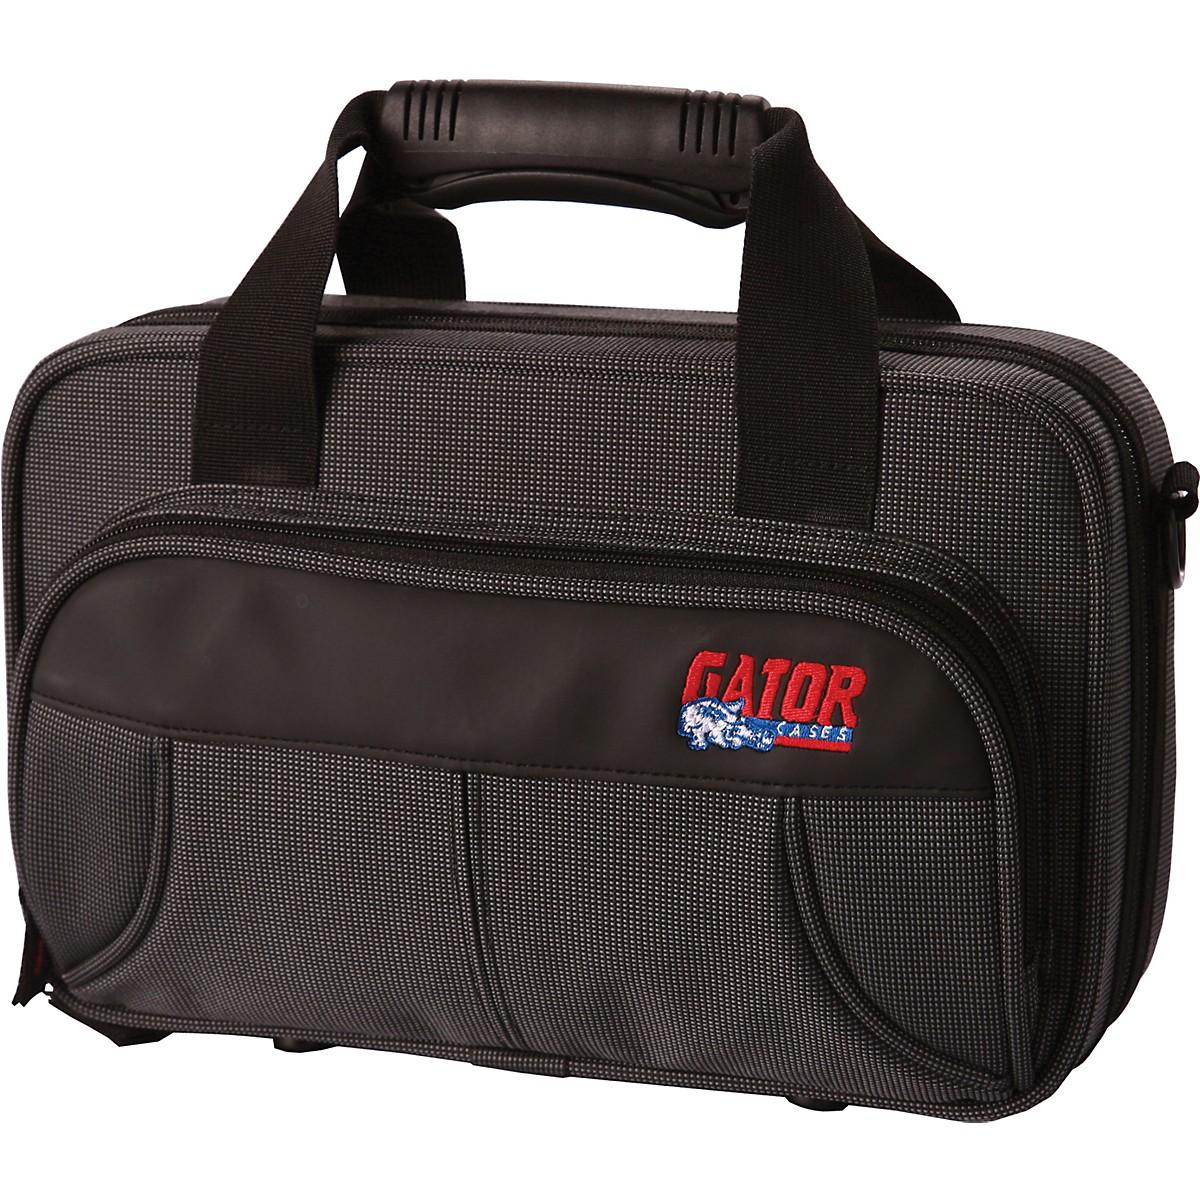 Gator GL Series Clarinet Case